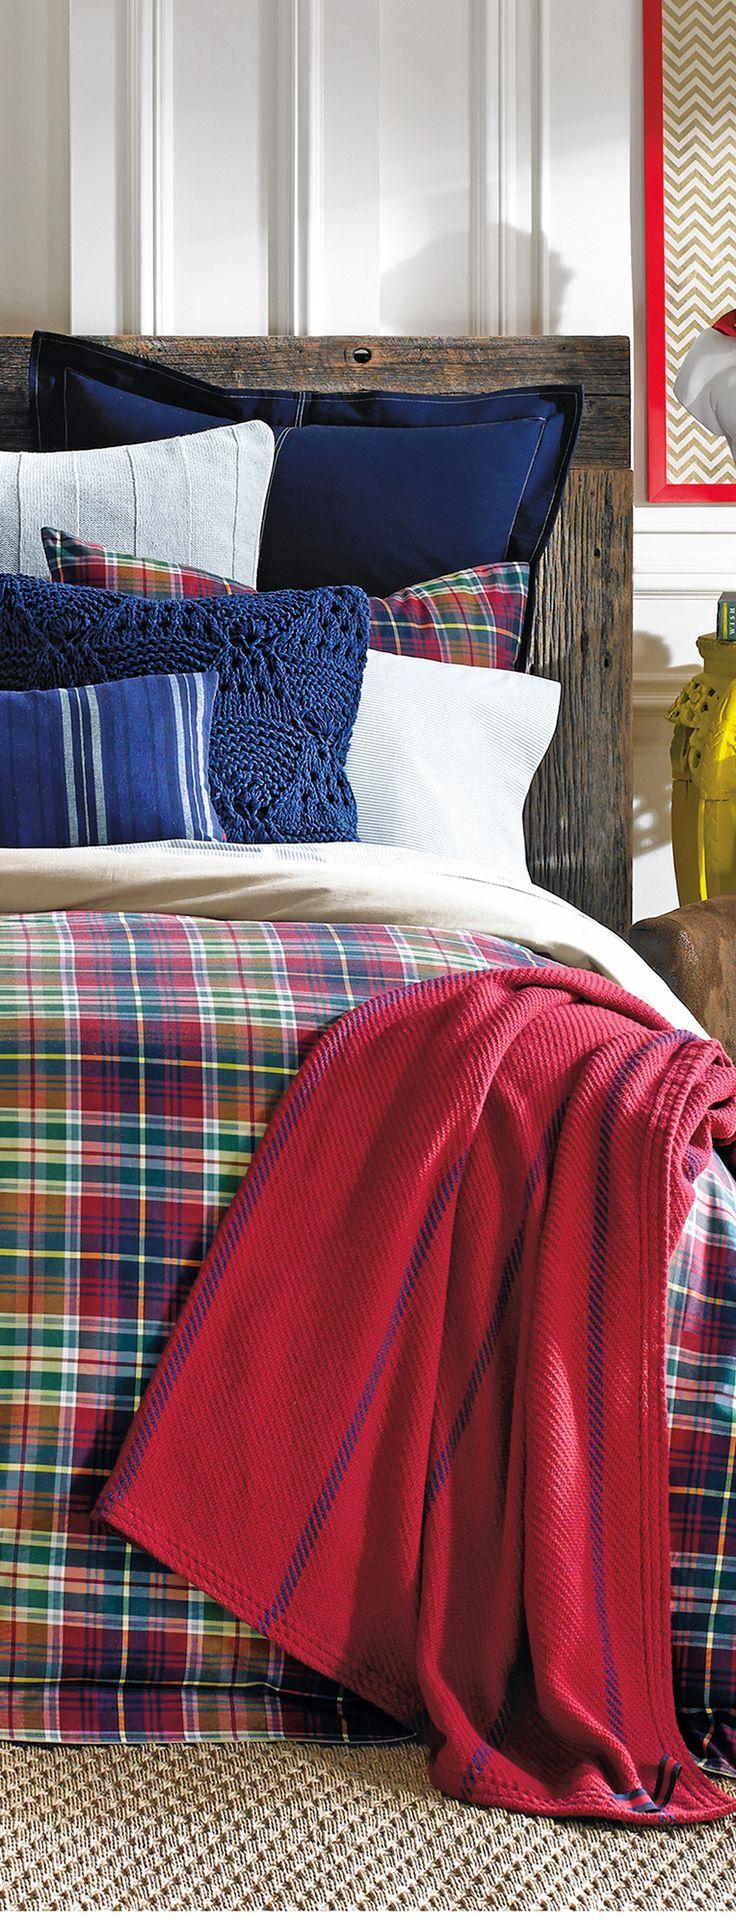 107 best boys bedding images on pinterest | kid beds